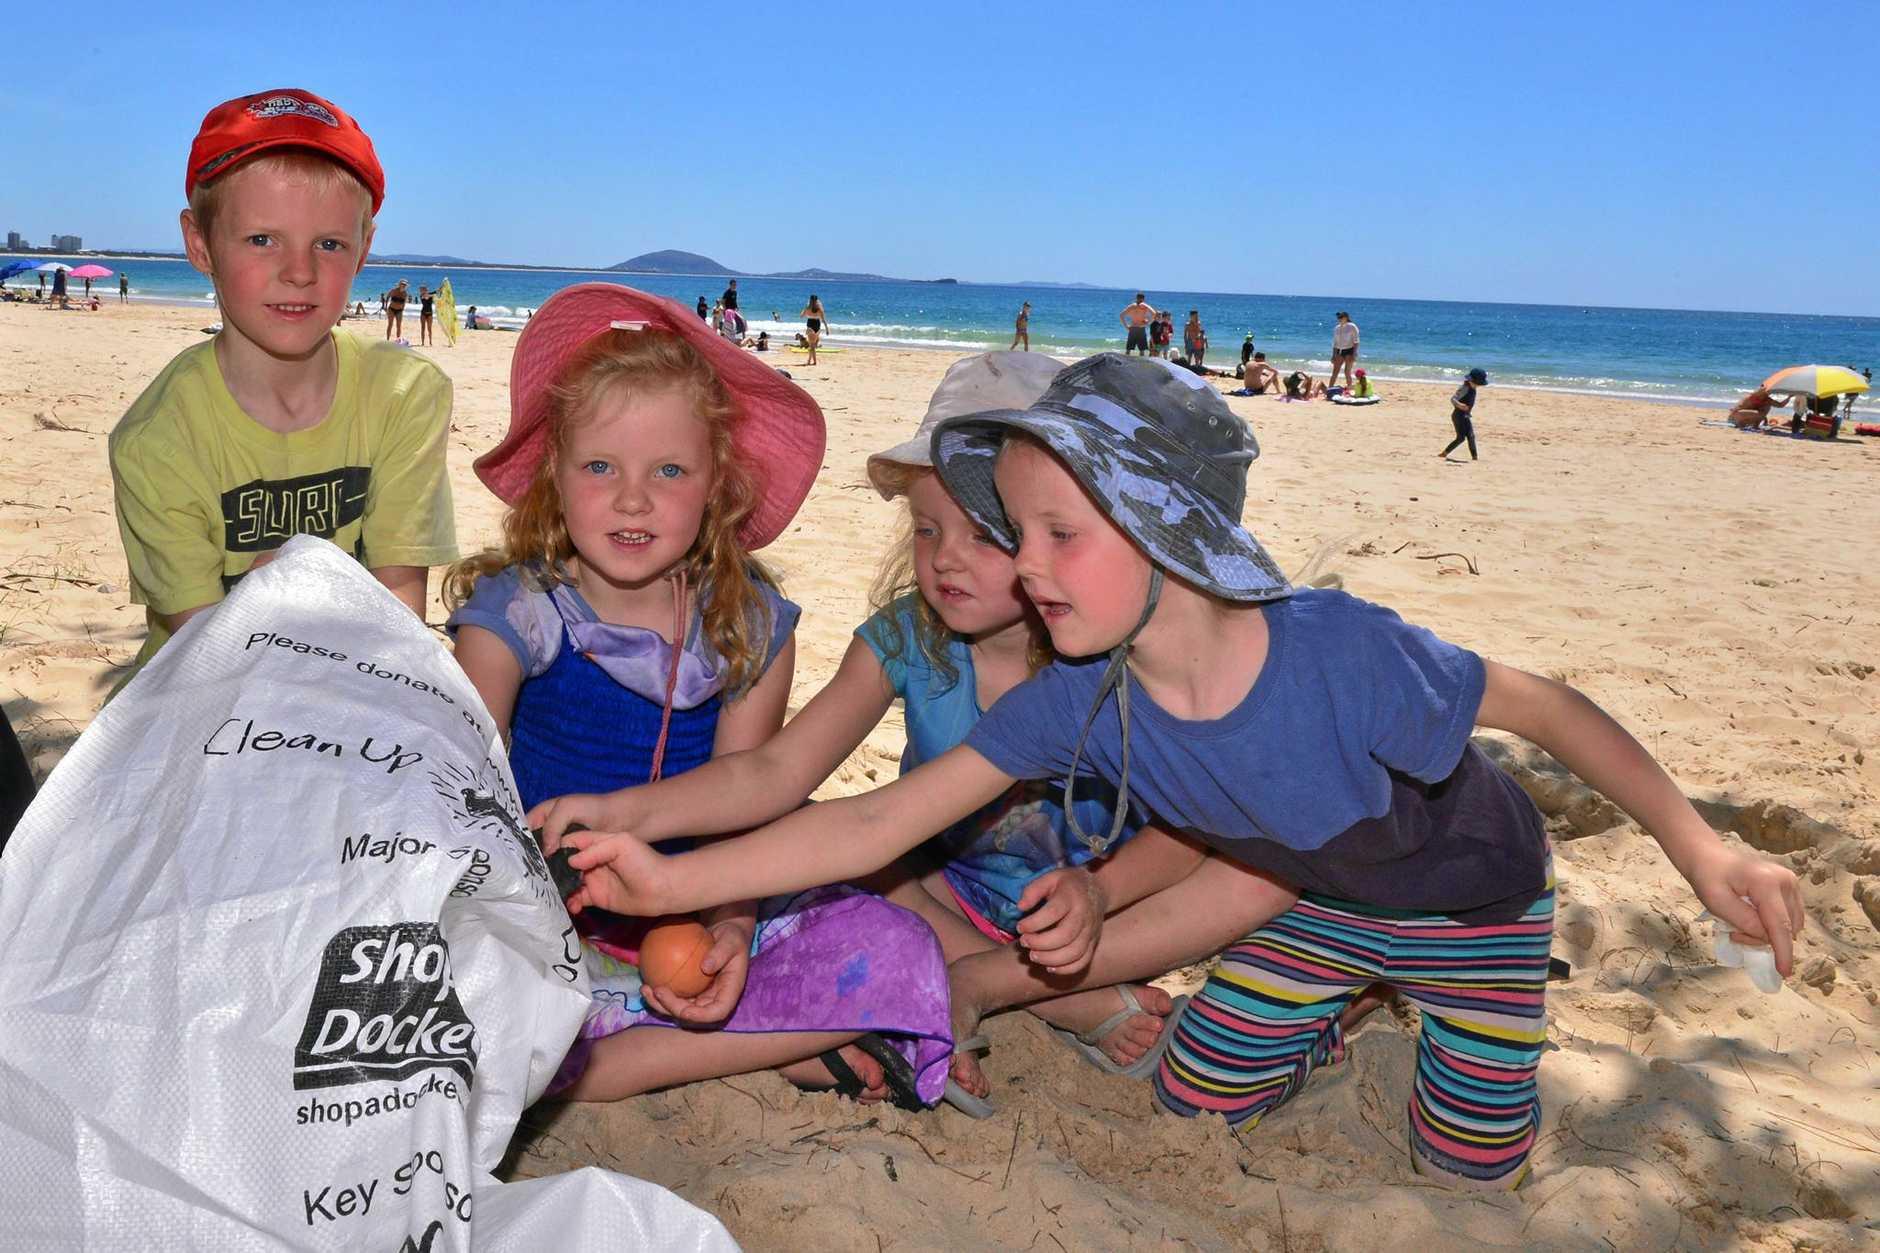 SEASIDE SCAVENGE: Ethan, Jasmine, Charlotte and Sienna Rourke help in the clean up of Mooloolaba Beach organised by Seaside Scavenge on Saturday, October 1, 2016.